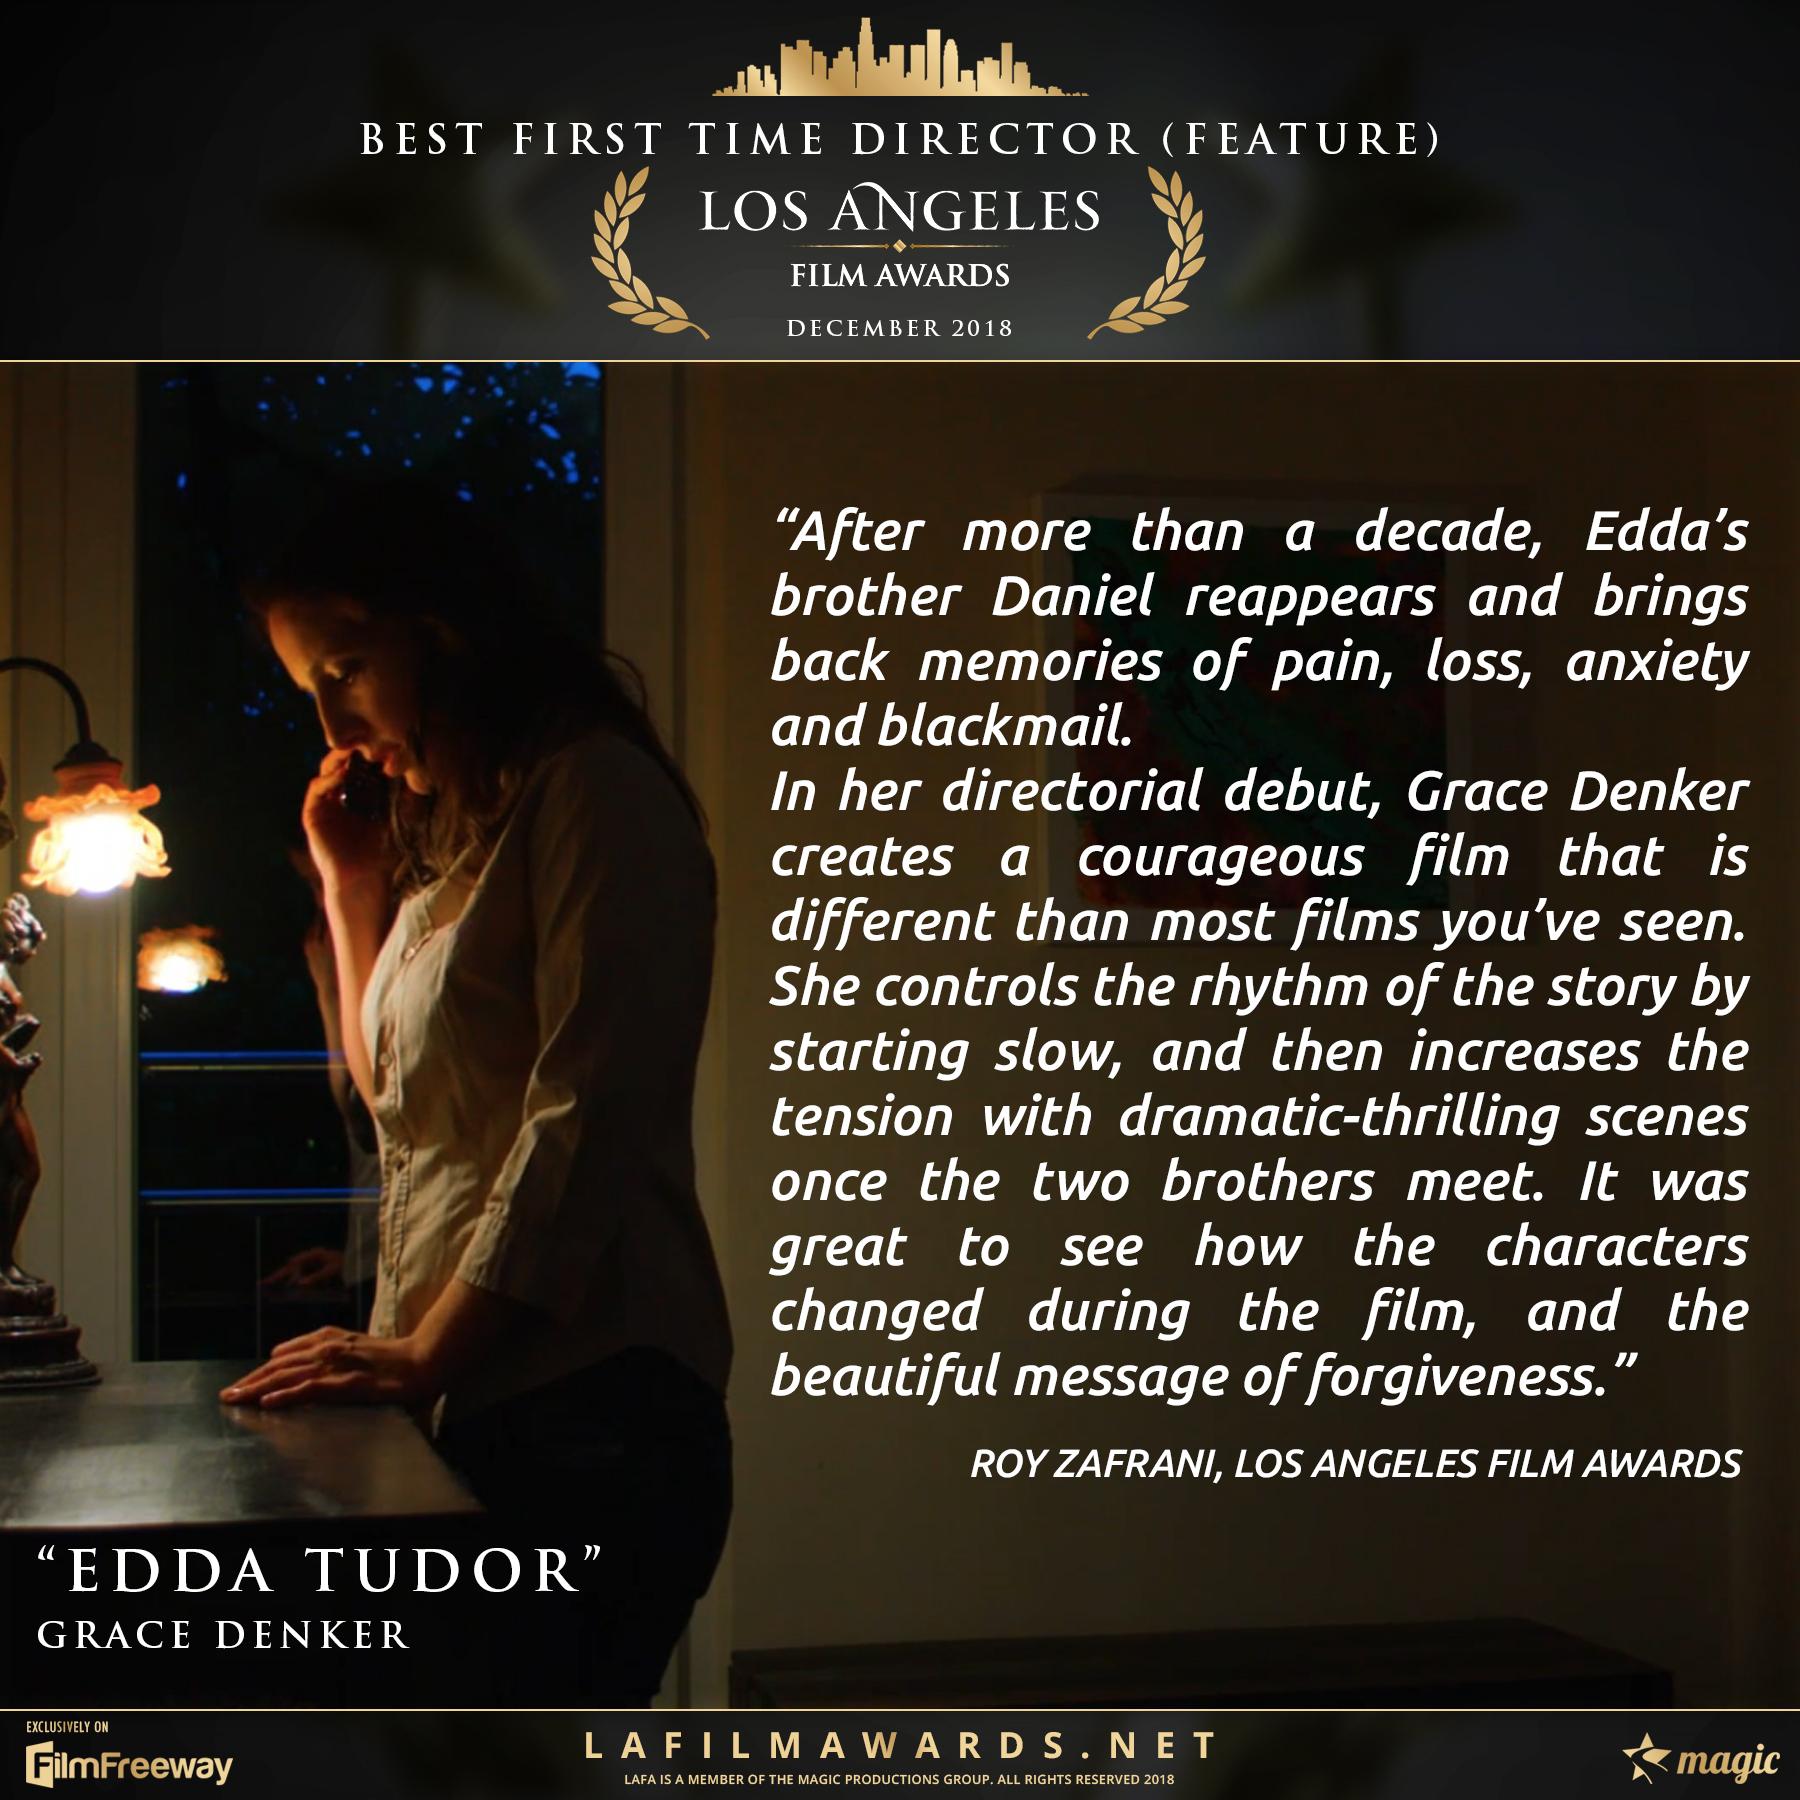 Edda Tudor - Review